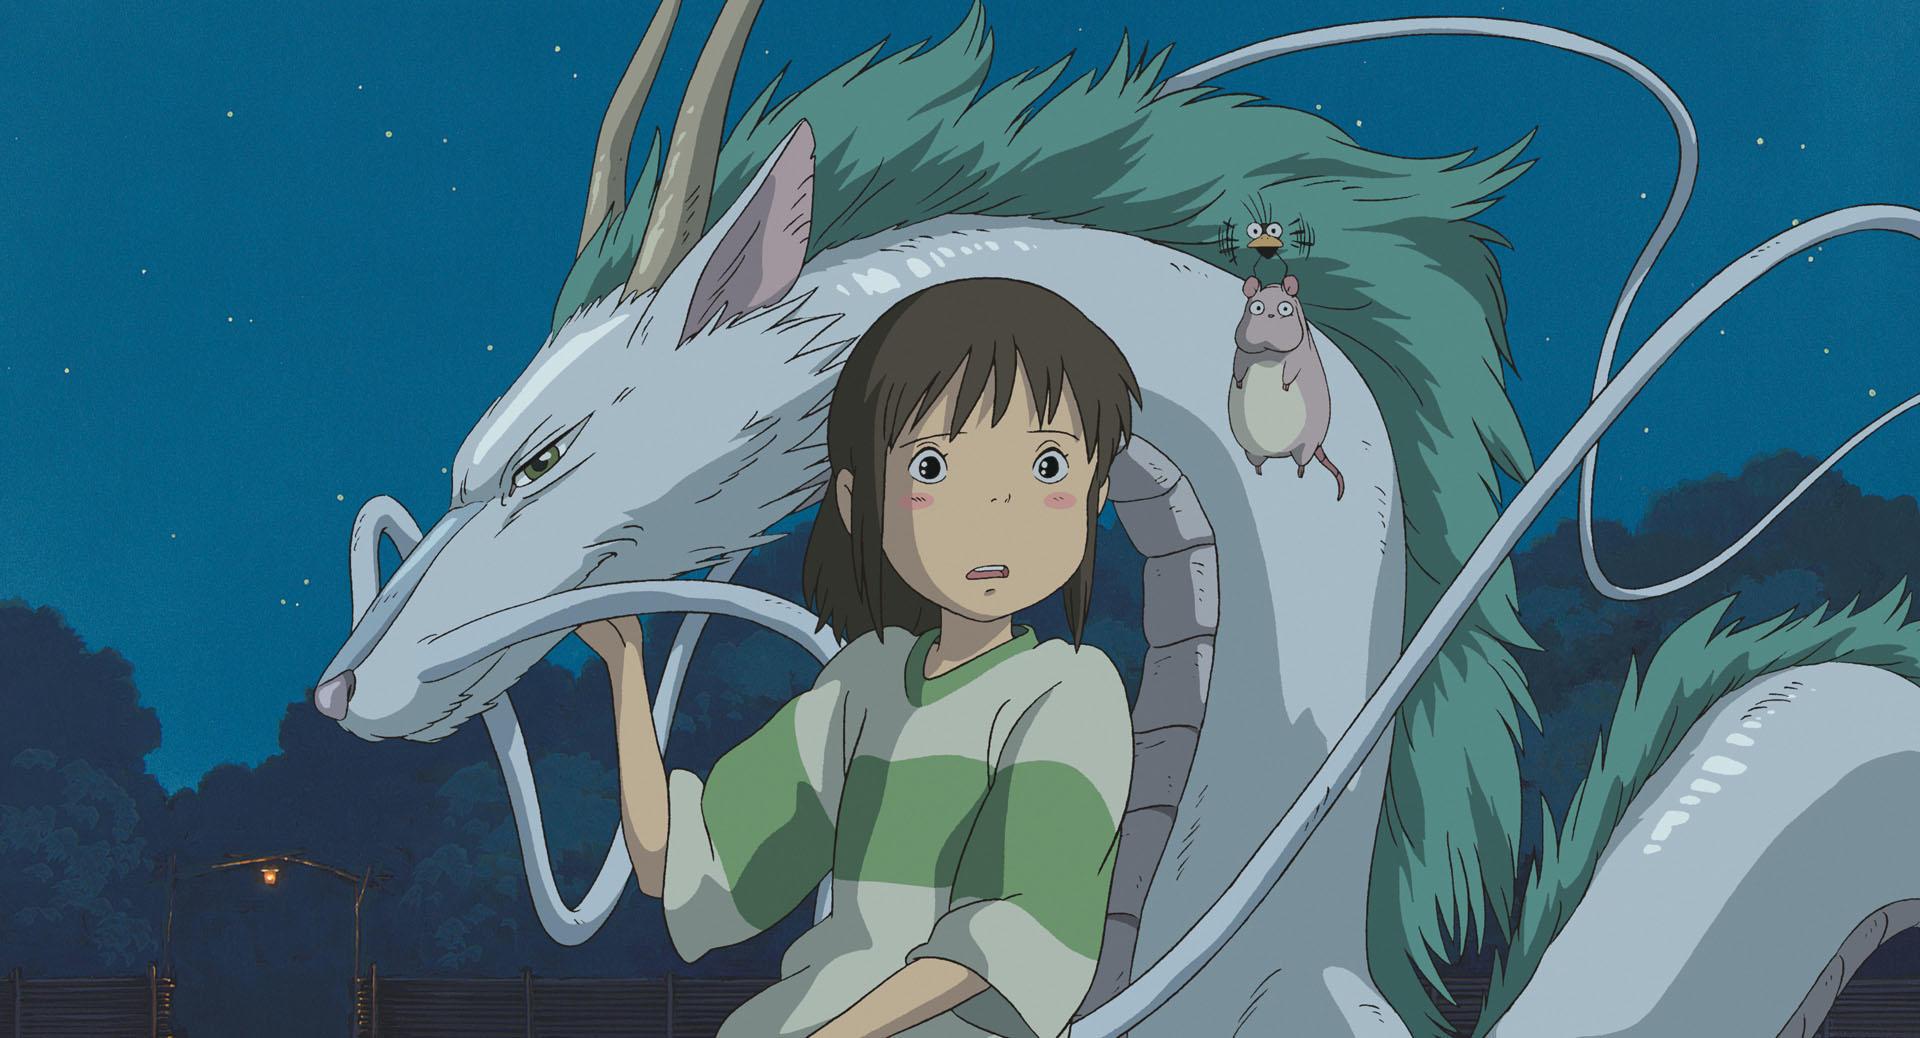 🥰 Japonśka muľtyplikacijna studija Ghibli opublikuvala 400 zobražeń zi svoїh fiľmiv